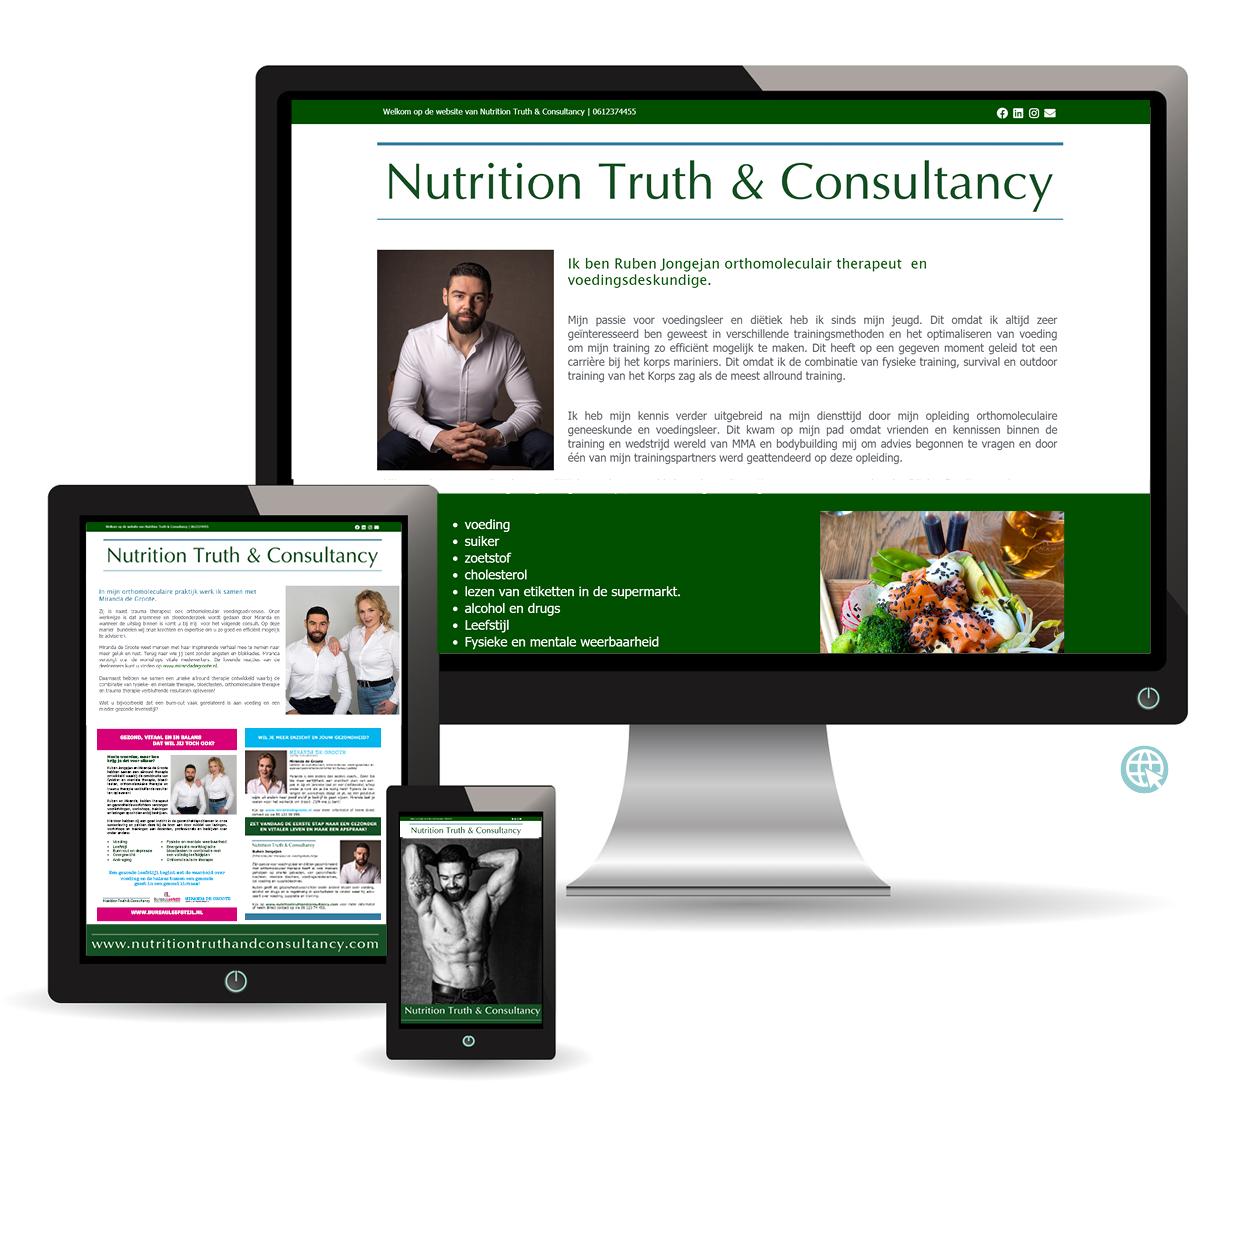 LucKim Webdesign www.nutritiontruthandconsultancy.com